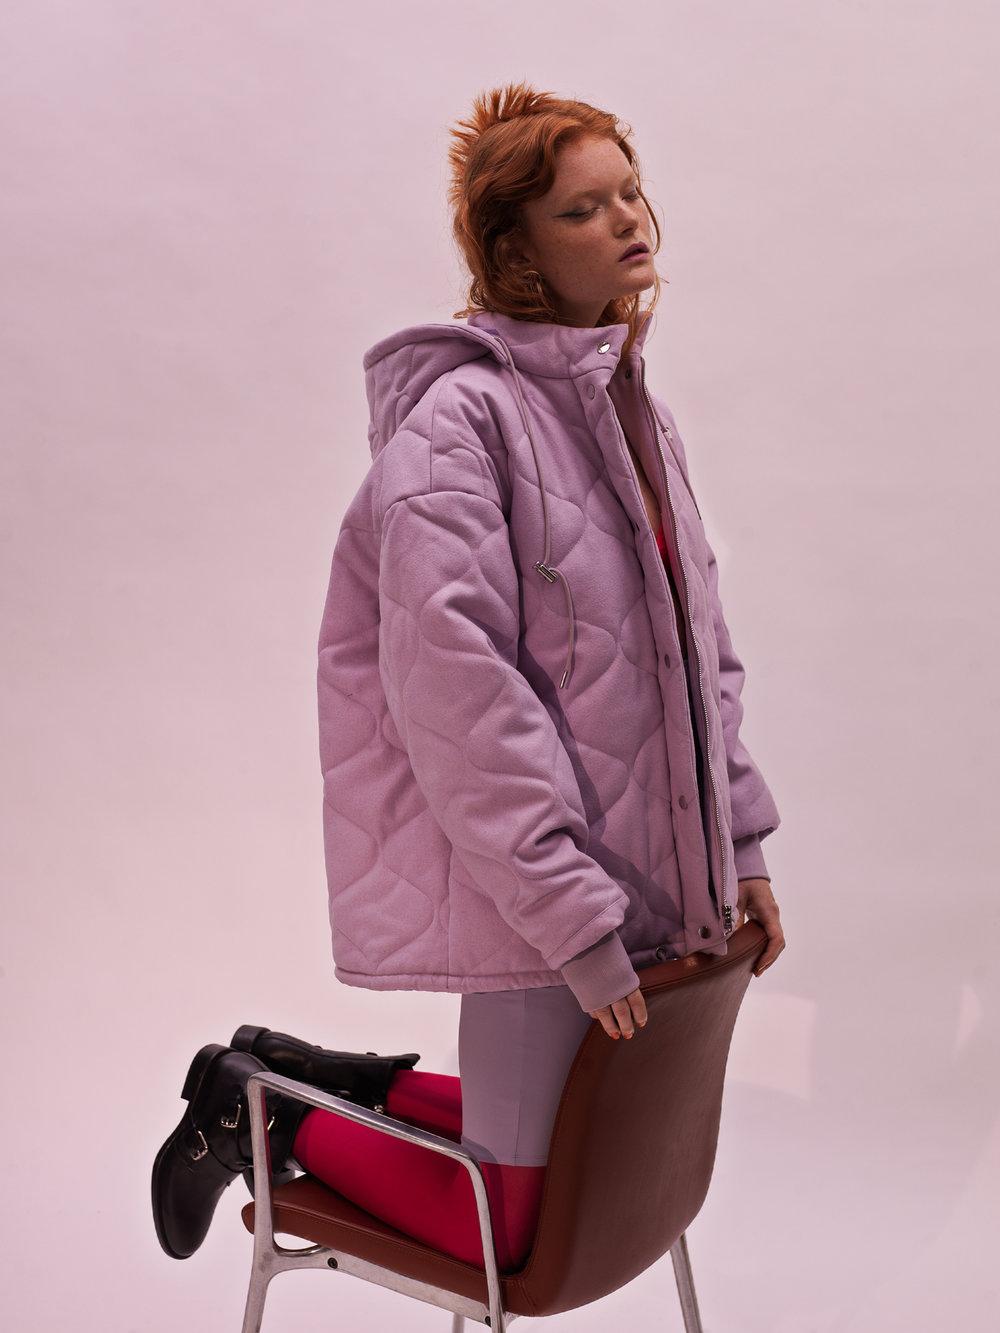 Zarina Green in Vogue Italia by fashion photographer Kia Hartelius